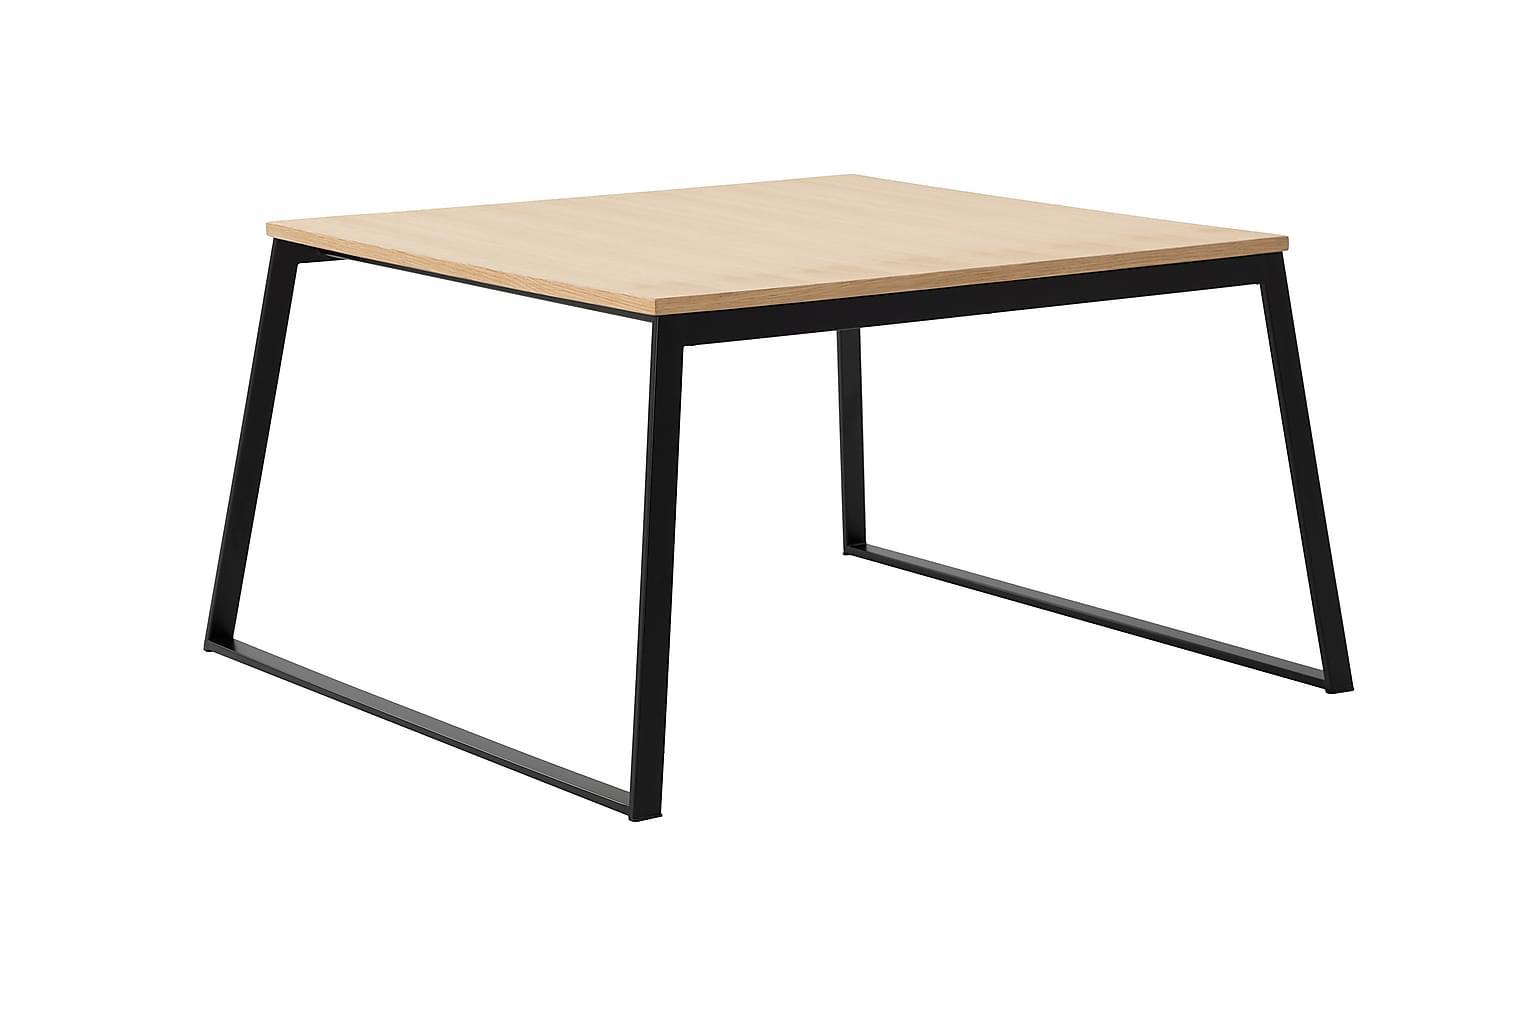 NATIVE Sohvapöytä 85 Musta/Tammi